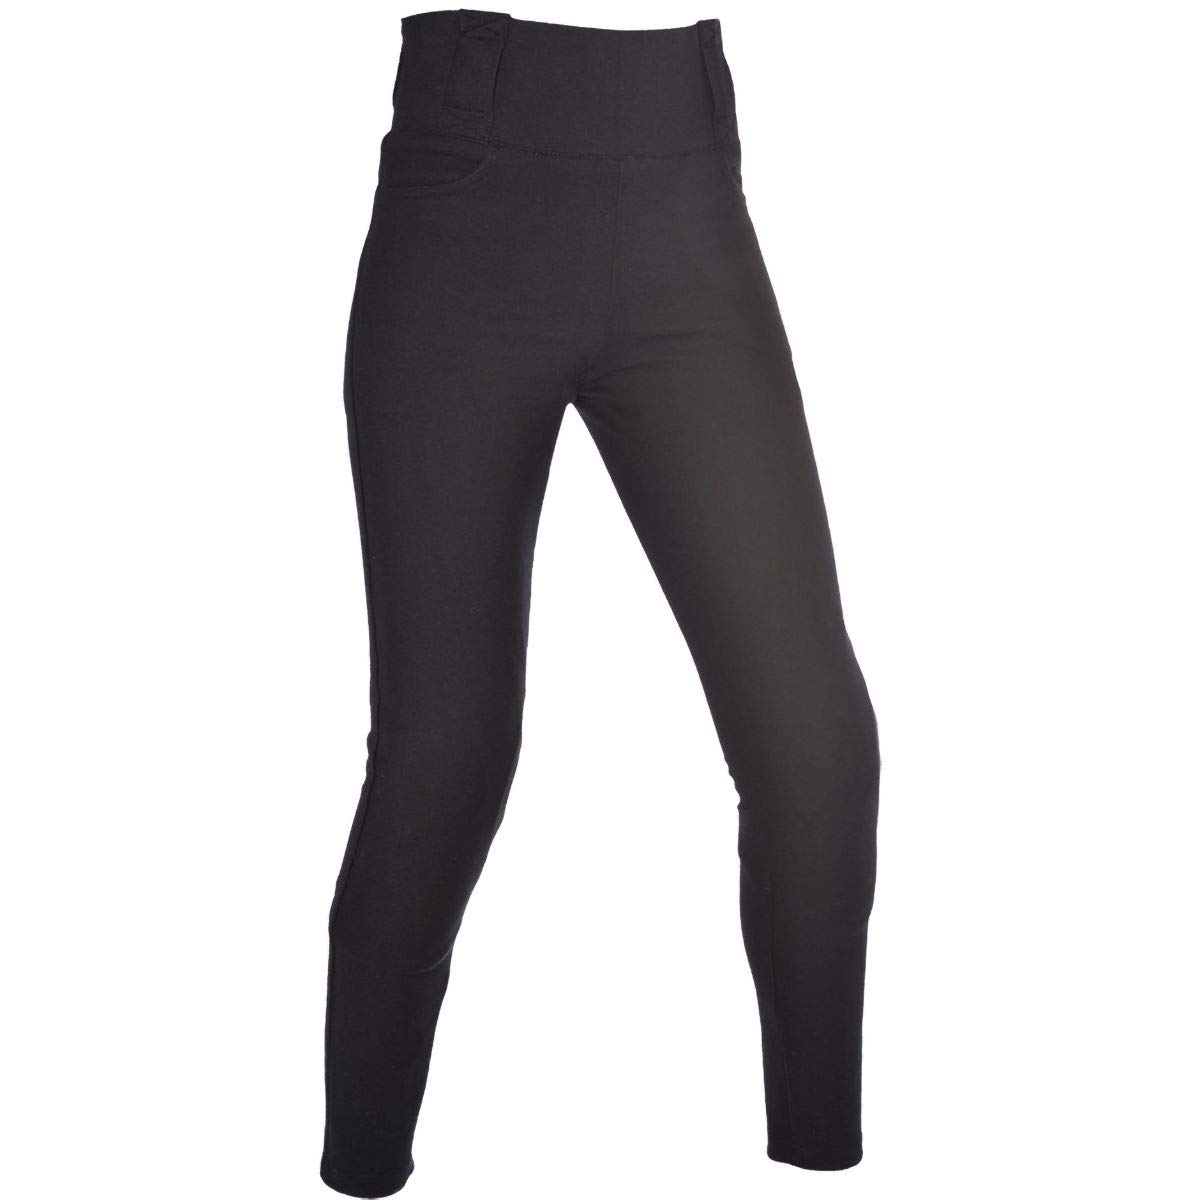 Oxford Super Womens Riding Protective Leggings Black, US Size 8